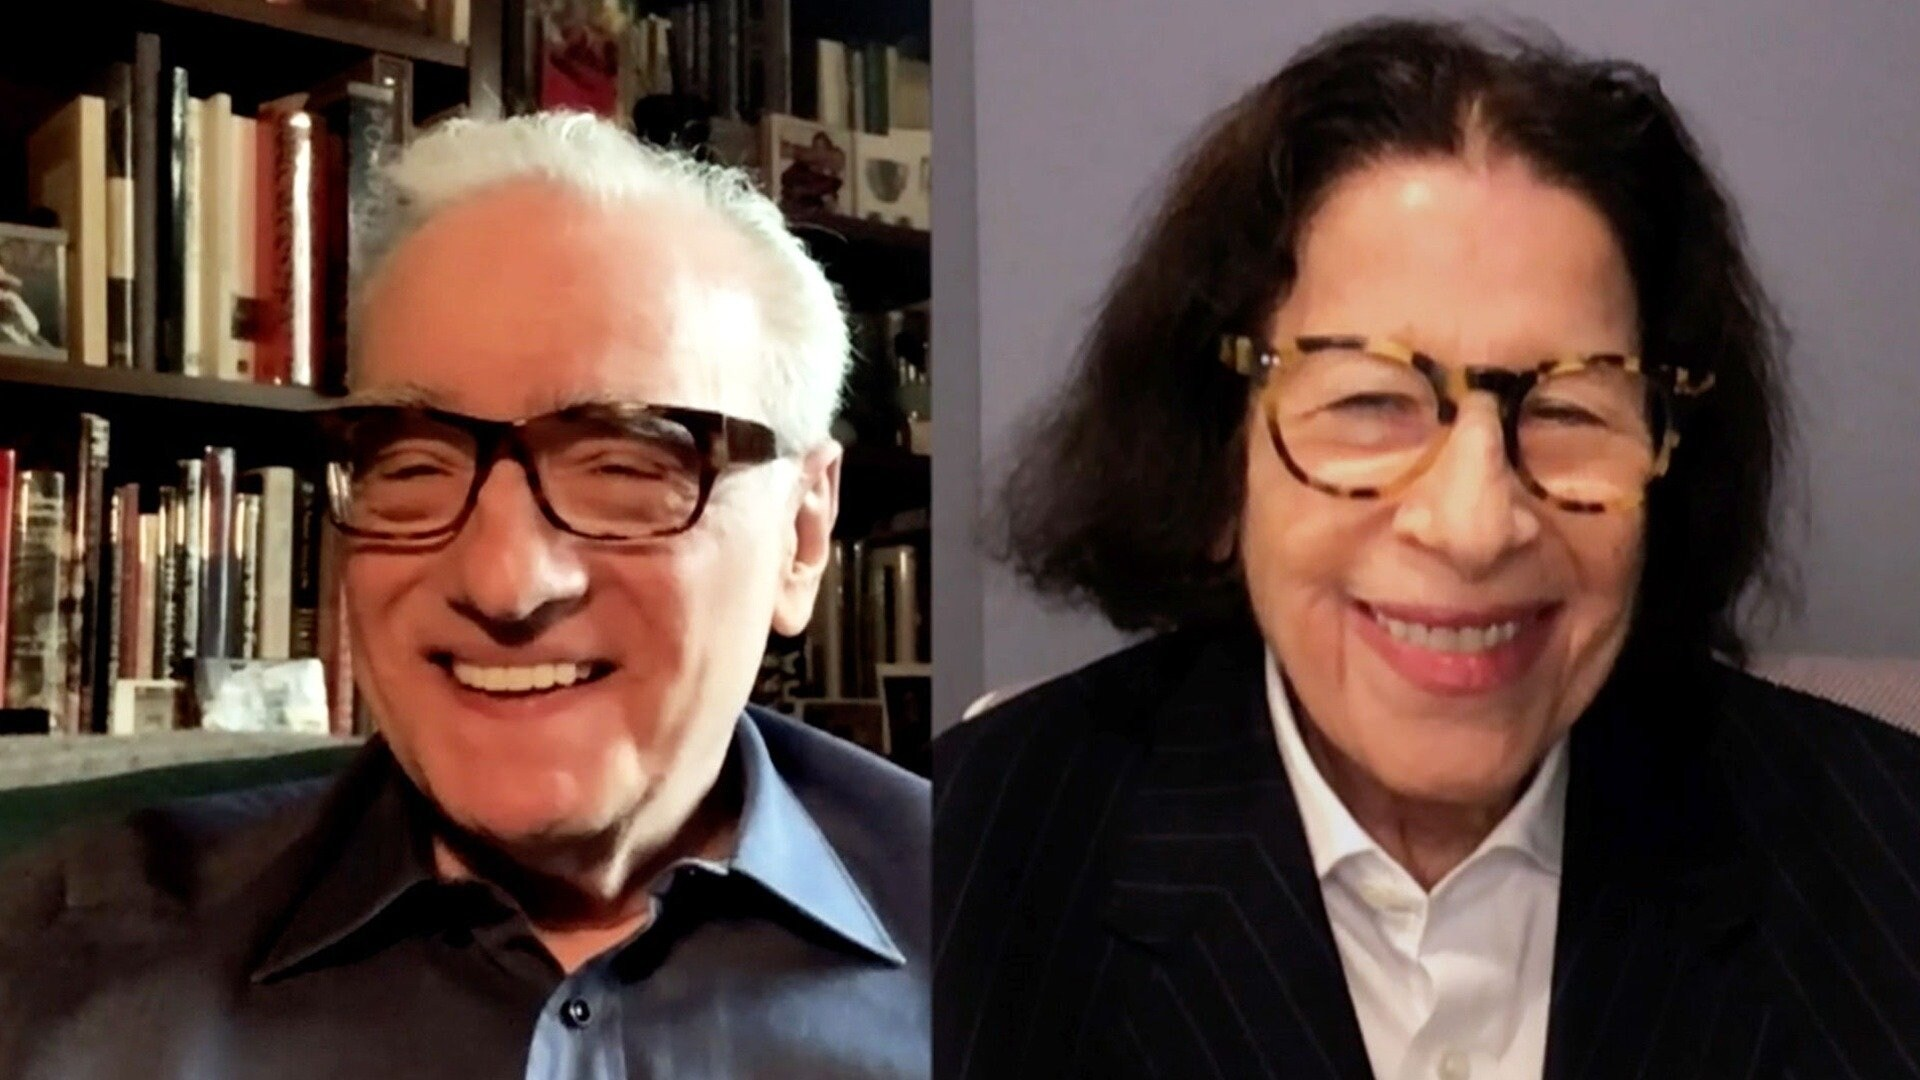 Martin Scorsese; Fran Lebowitz; Pete Buttigieg; Hunter Schafer; Playboi Carti